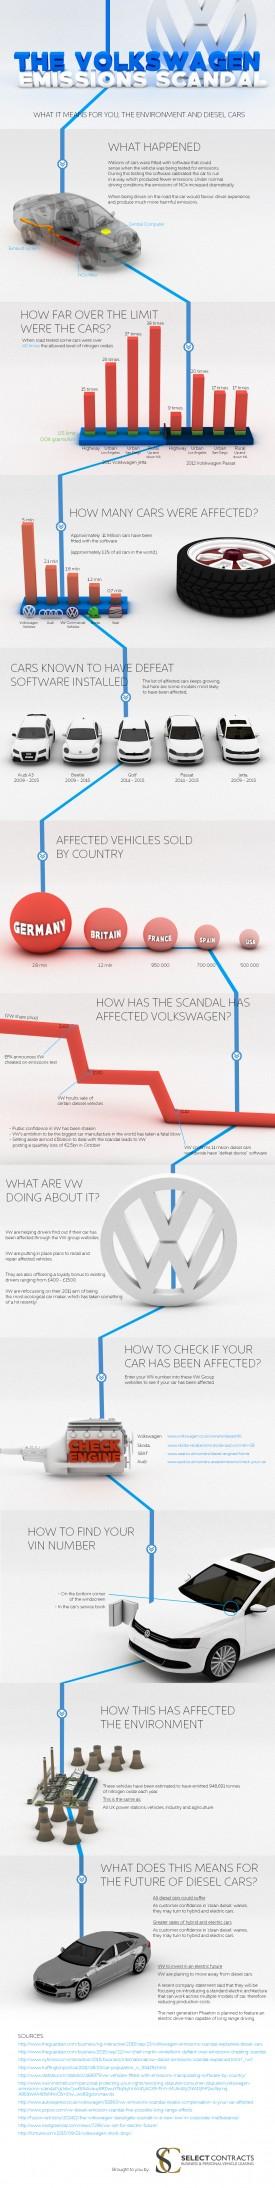 VWInfographic